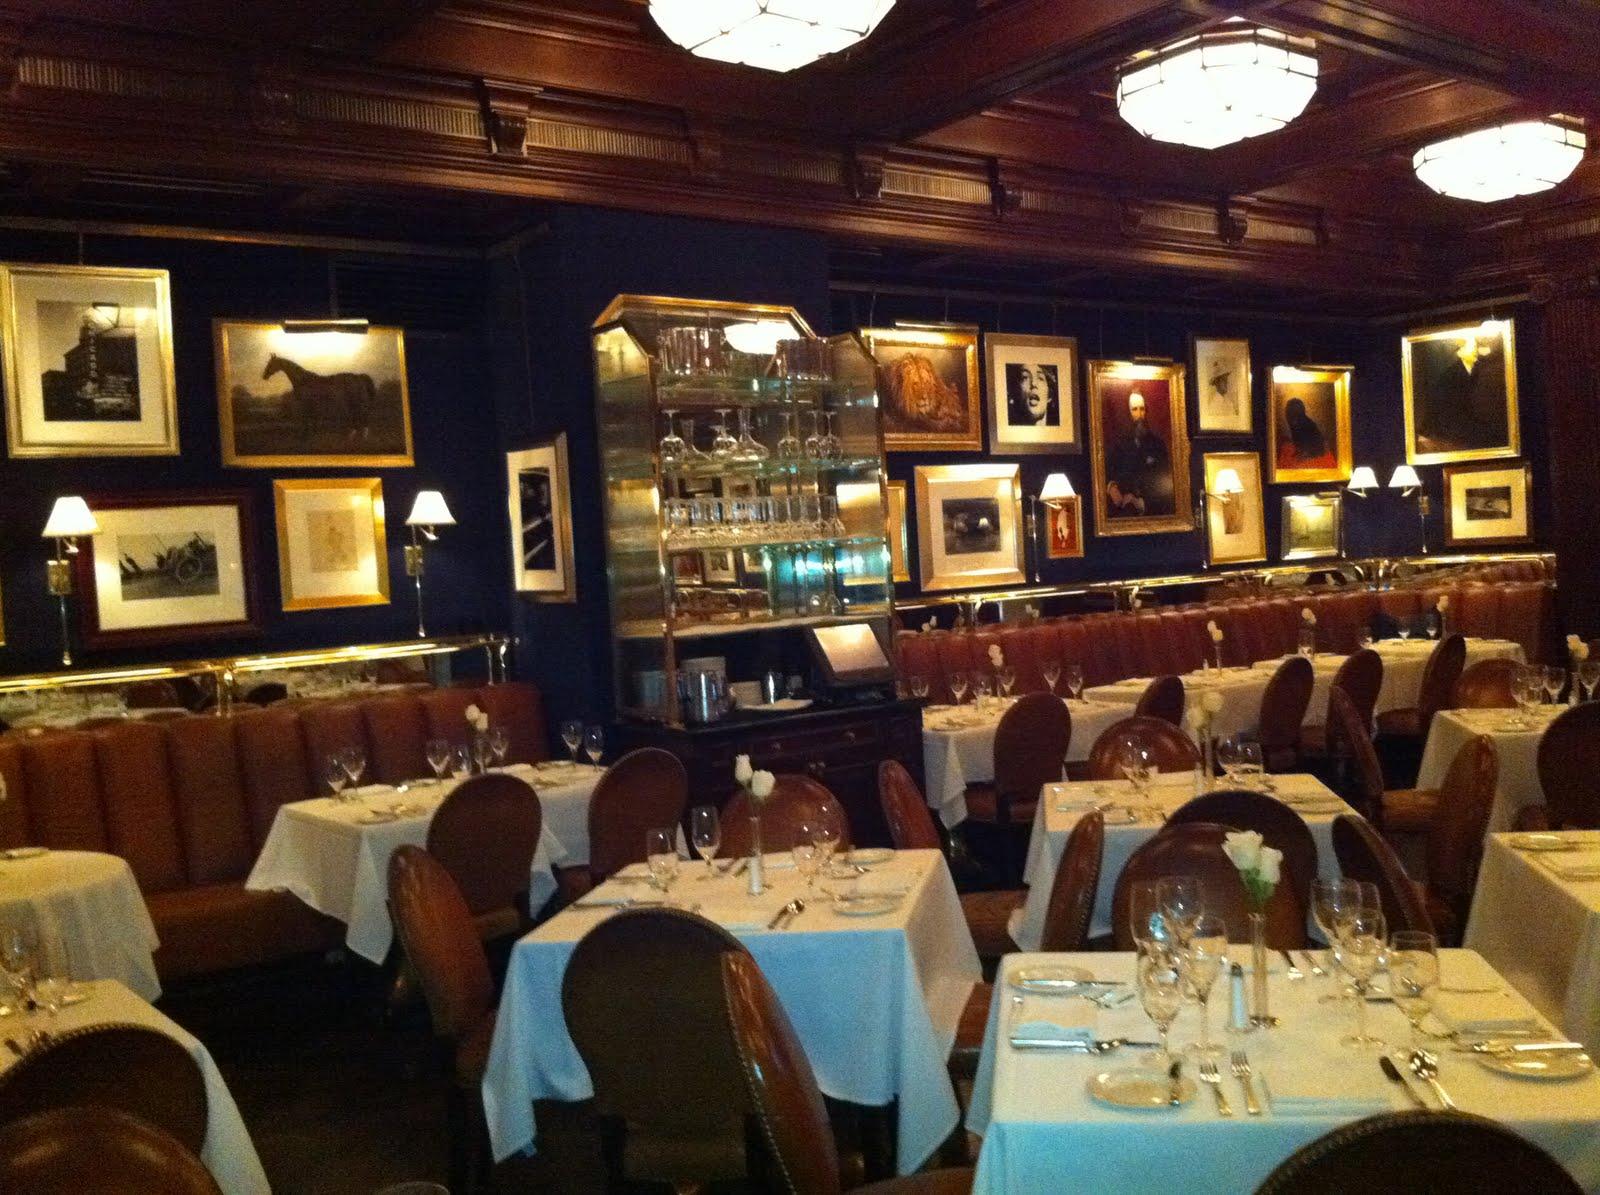 kiran 39 s corner review of the rl restaurant in chicago. Black Bedroom Furniture Sets. Home Design Ideas